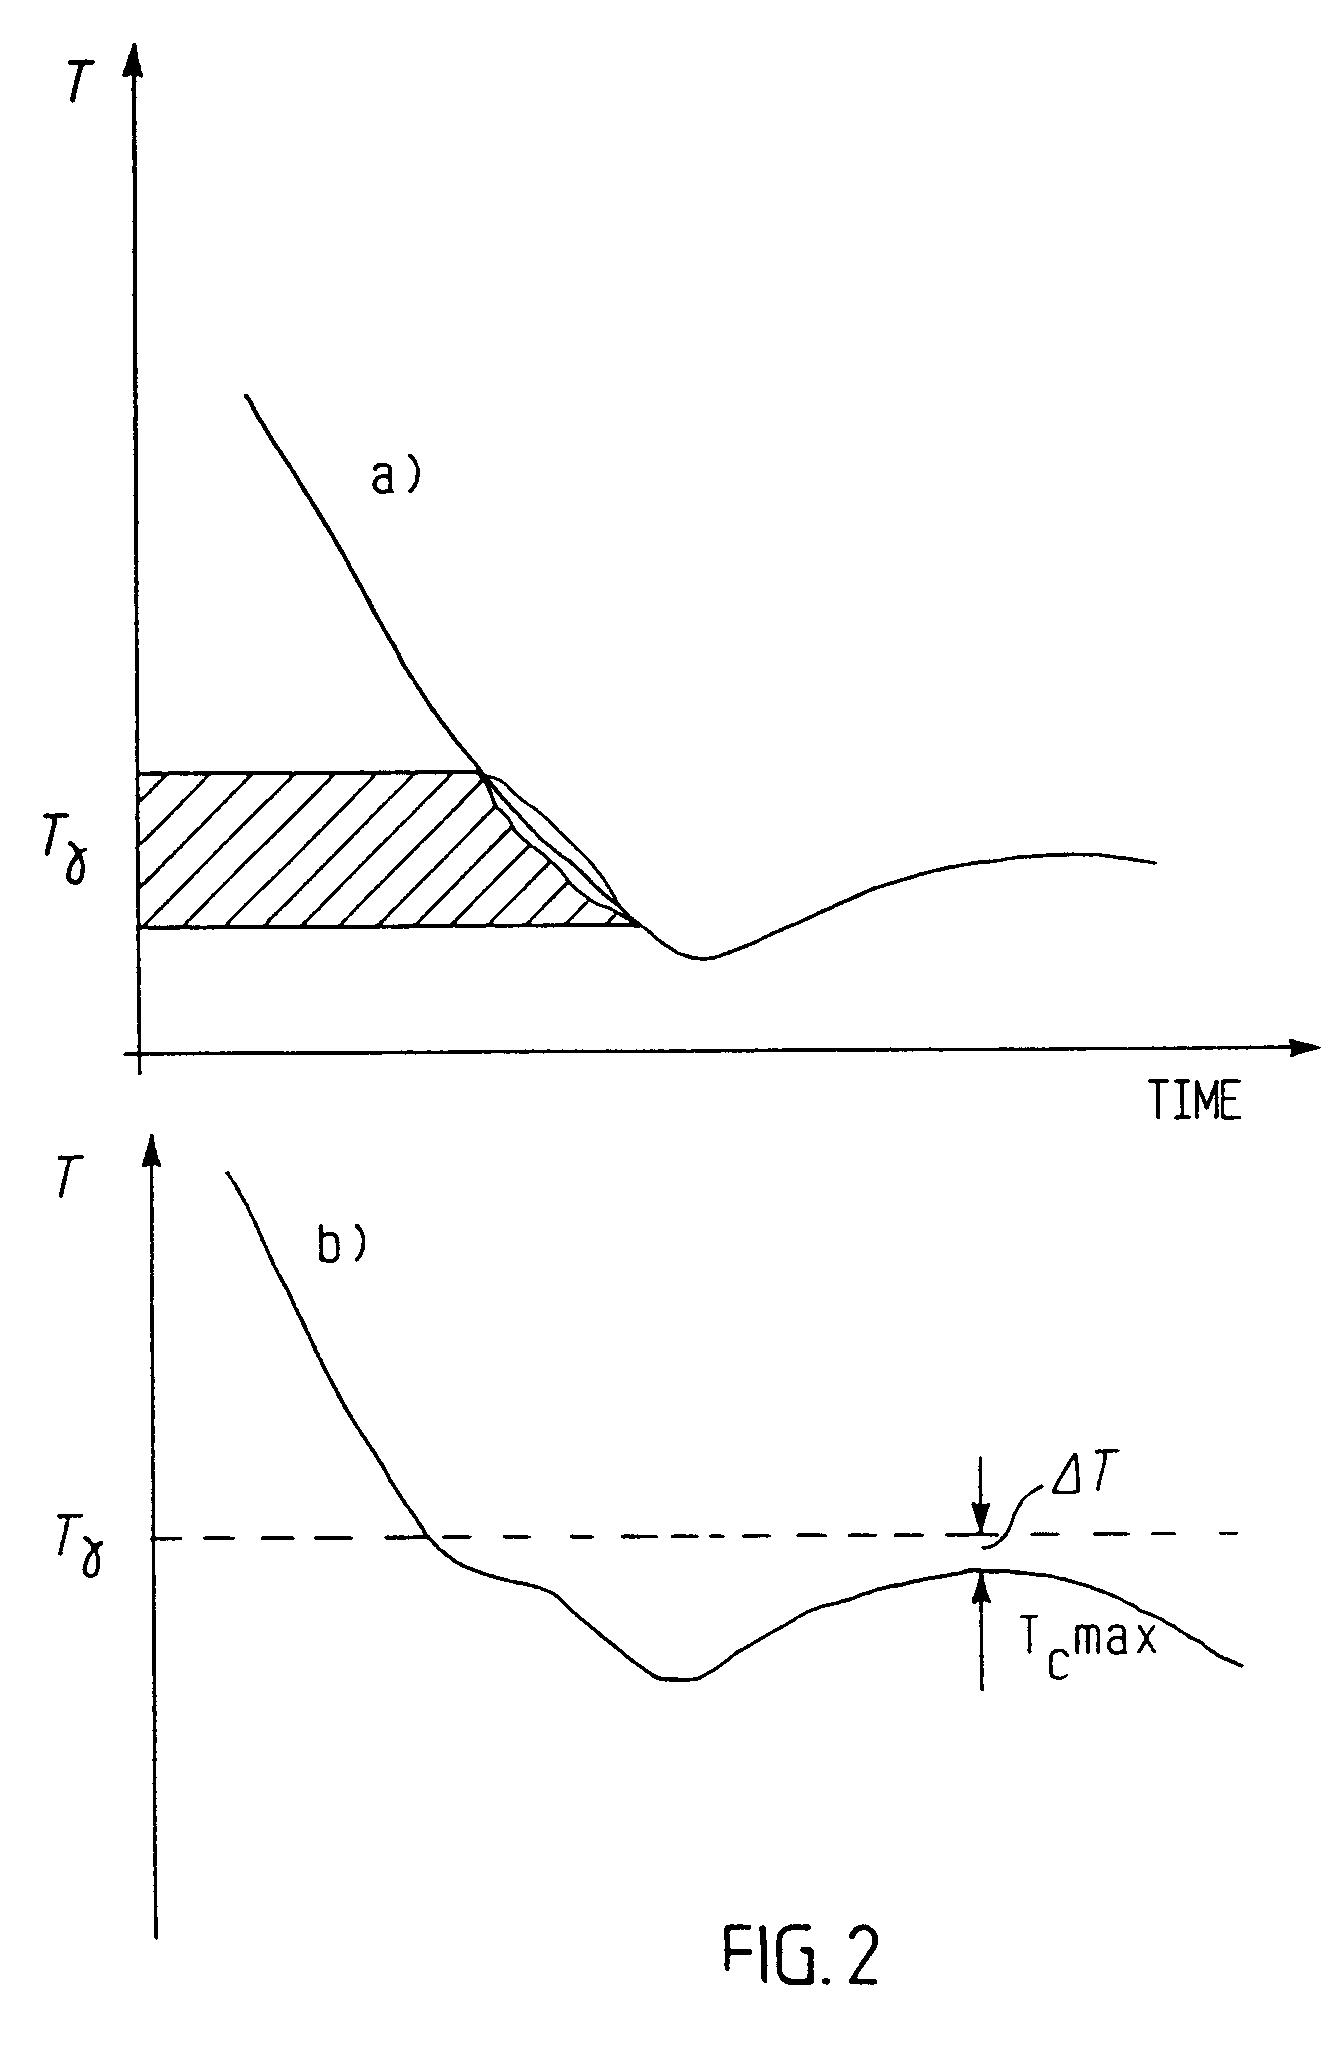 explain iron carbon equilibrium diagram jacuzzi wiring south africa patent ep0633817b1 the determination of